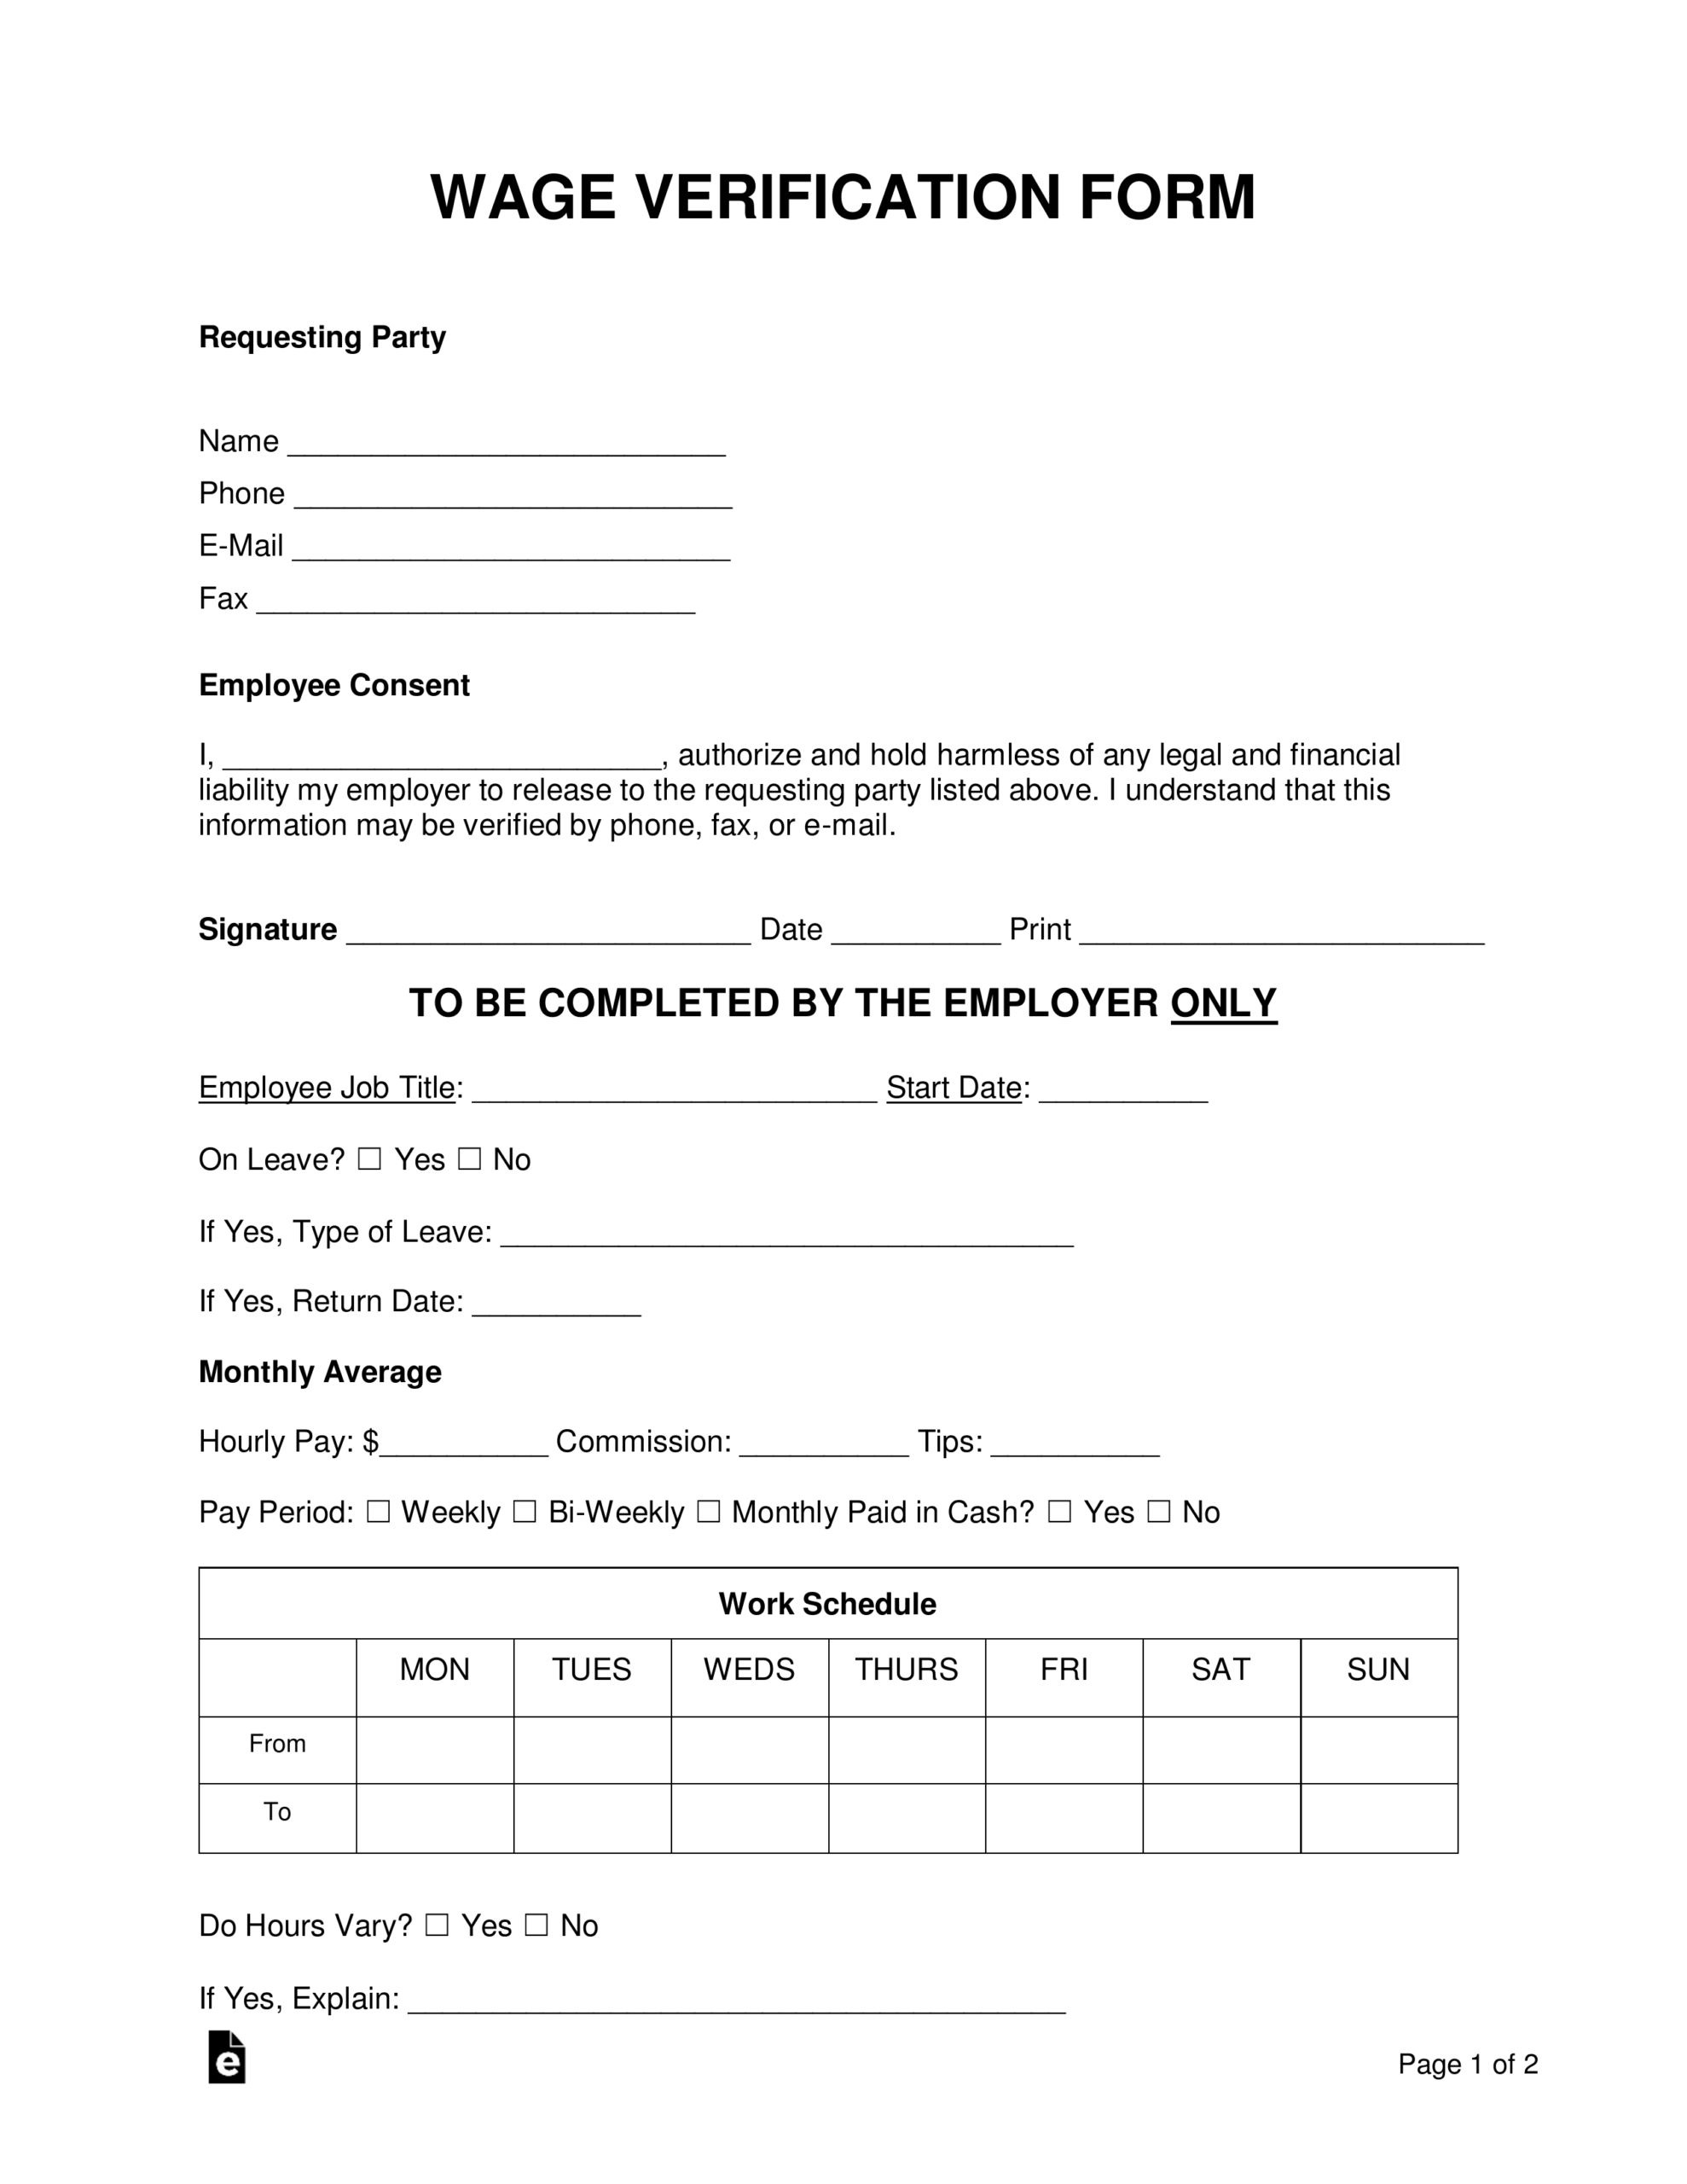 Free Wage Verification Form - Pdf | Word | Eforms